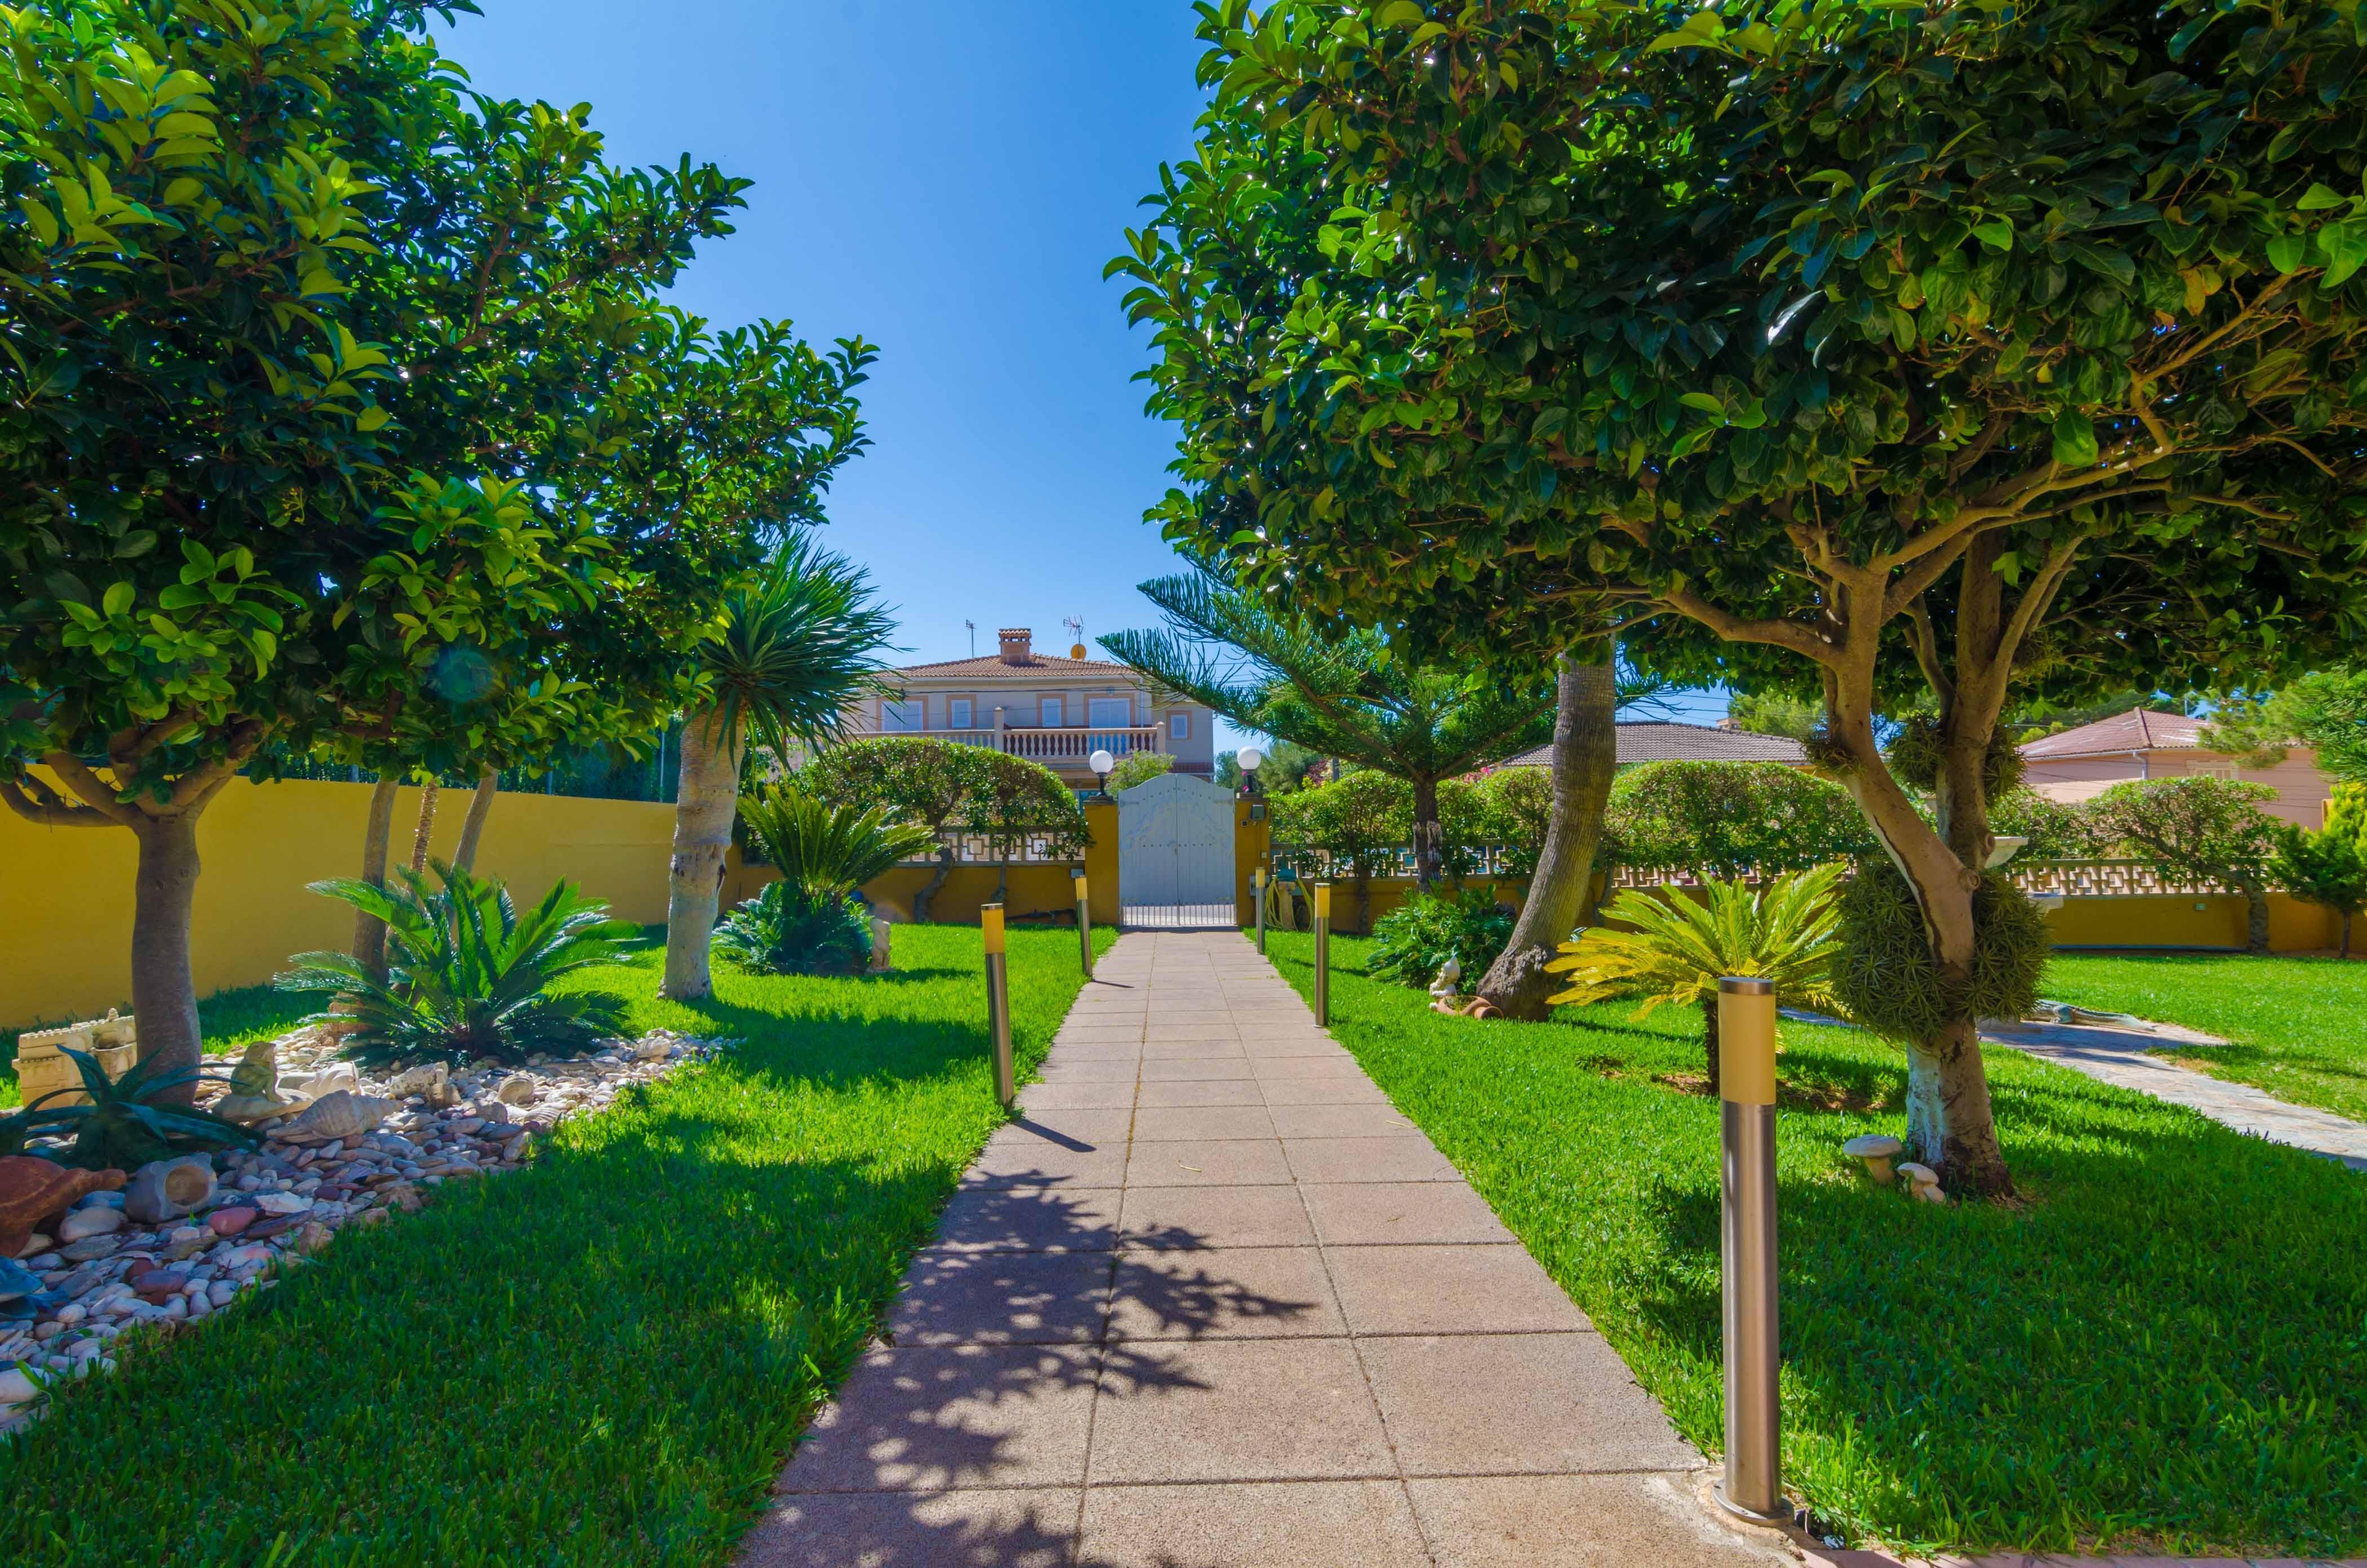 Ferienhaus CAN GORI (2296828), Badia Gran, Mallorca, Balearische Inseln, Spanien, Bild 32